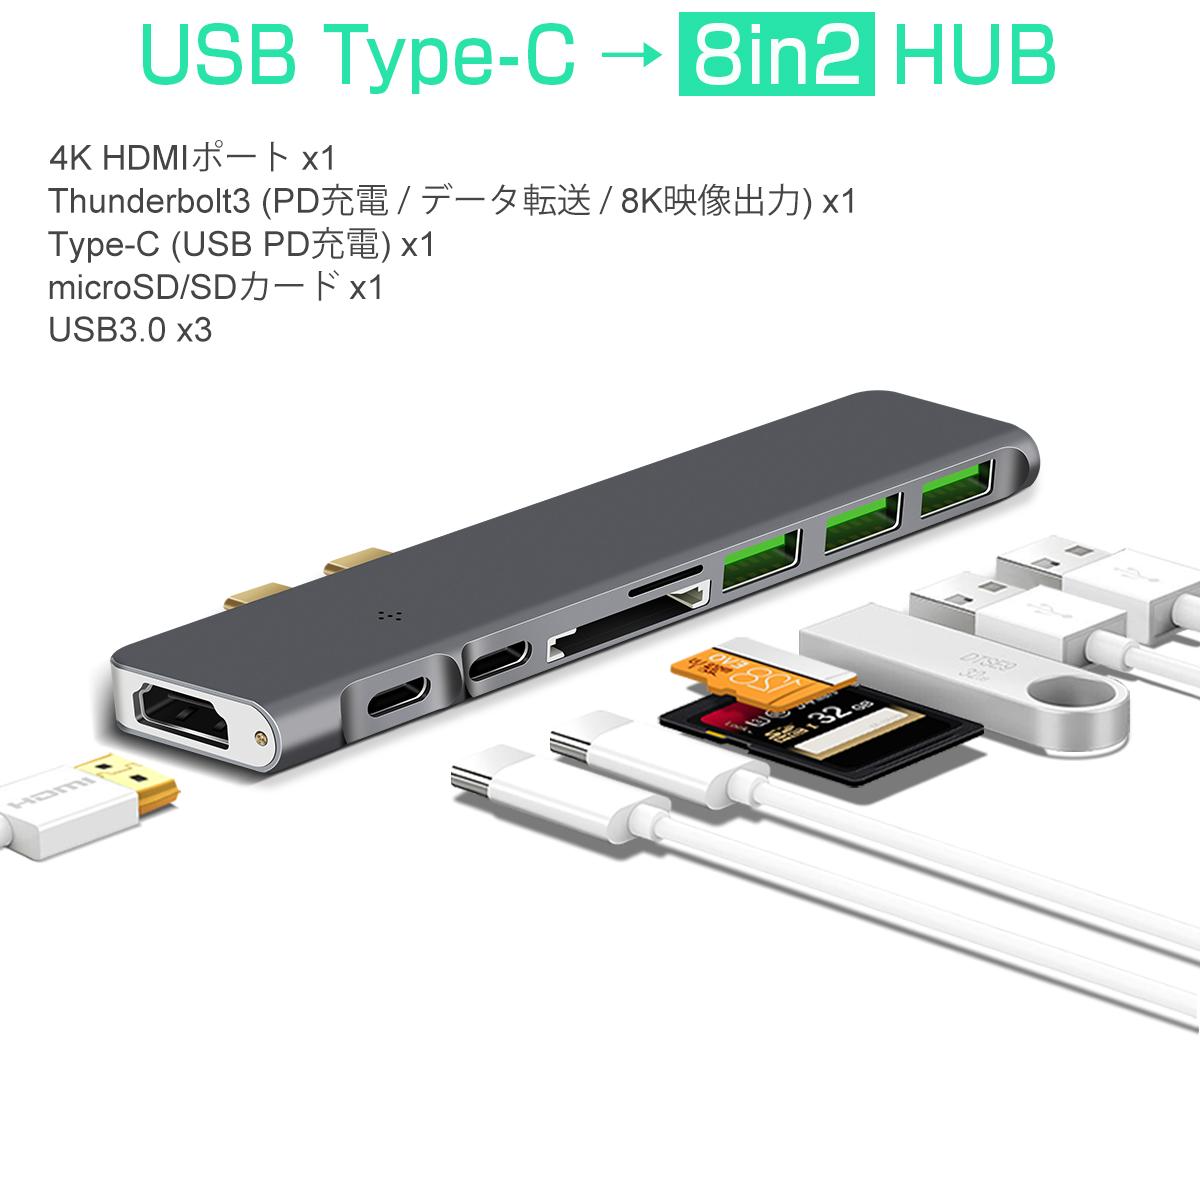 USB Type C MacBook Pro ハブ MacBook Air 2019対応 8in1 4K HDMI Thunderbolt3 8K出力 40Gbps PD充電 USB 3.0ポートx3 高速データ転送 microSD SDスロット 拡張 変換 アルミ スペースグレイ MacBookに馴染むデザイン設計 軽量 SDM便送料無料 3ヶ月保証 K&M